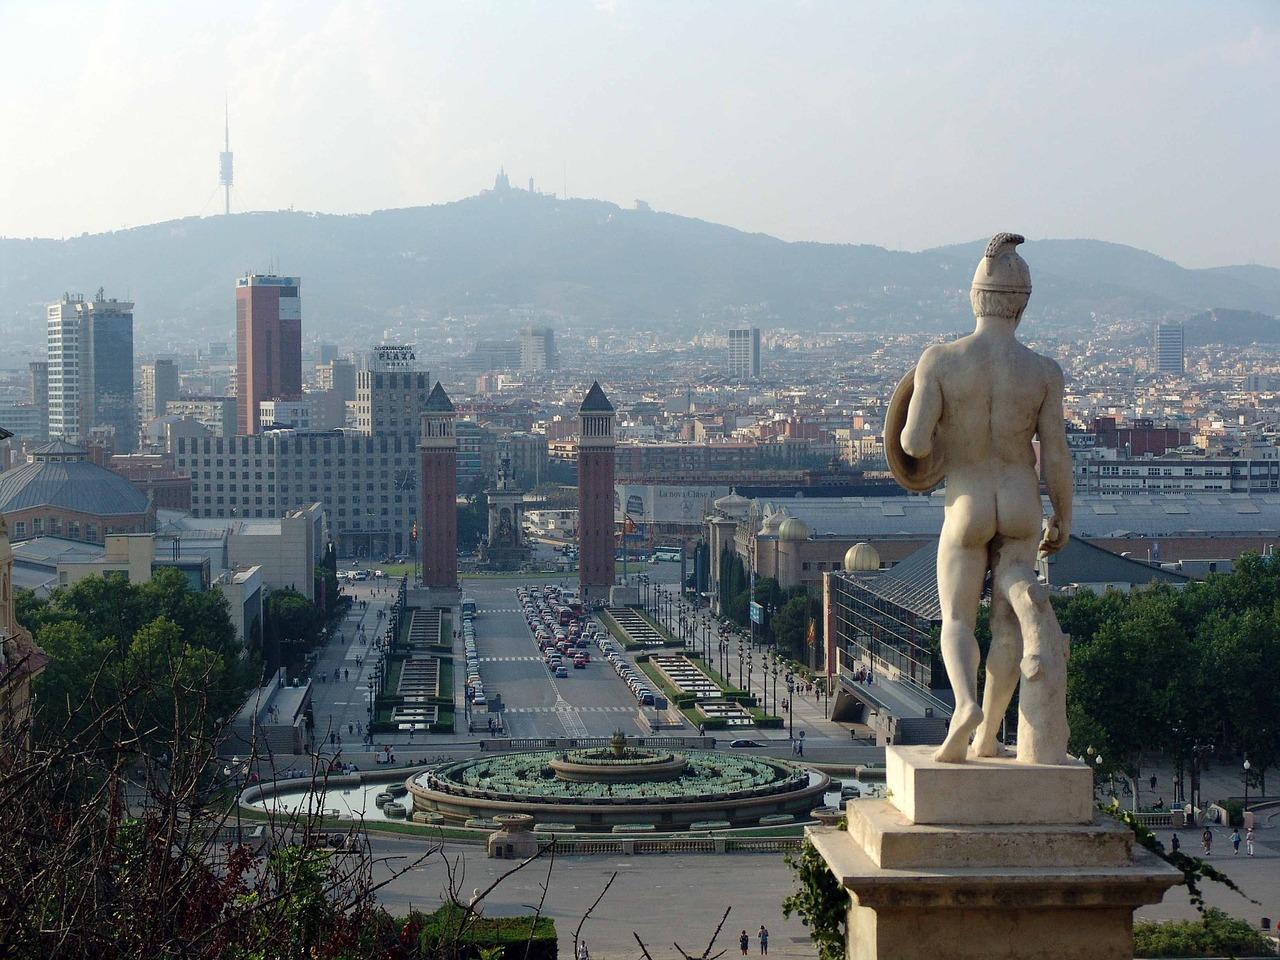 Alquilar barato en Barcelona, ¿Dónde?